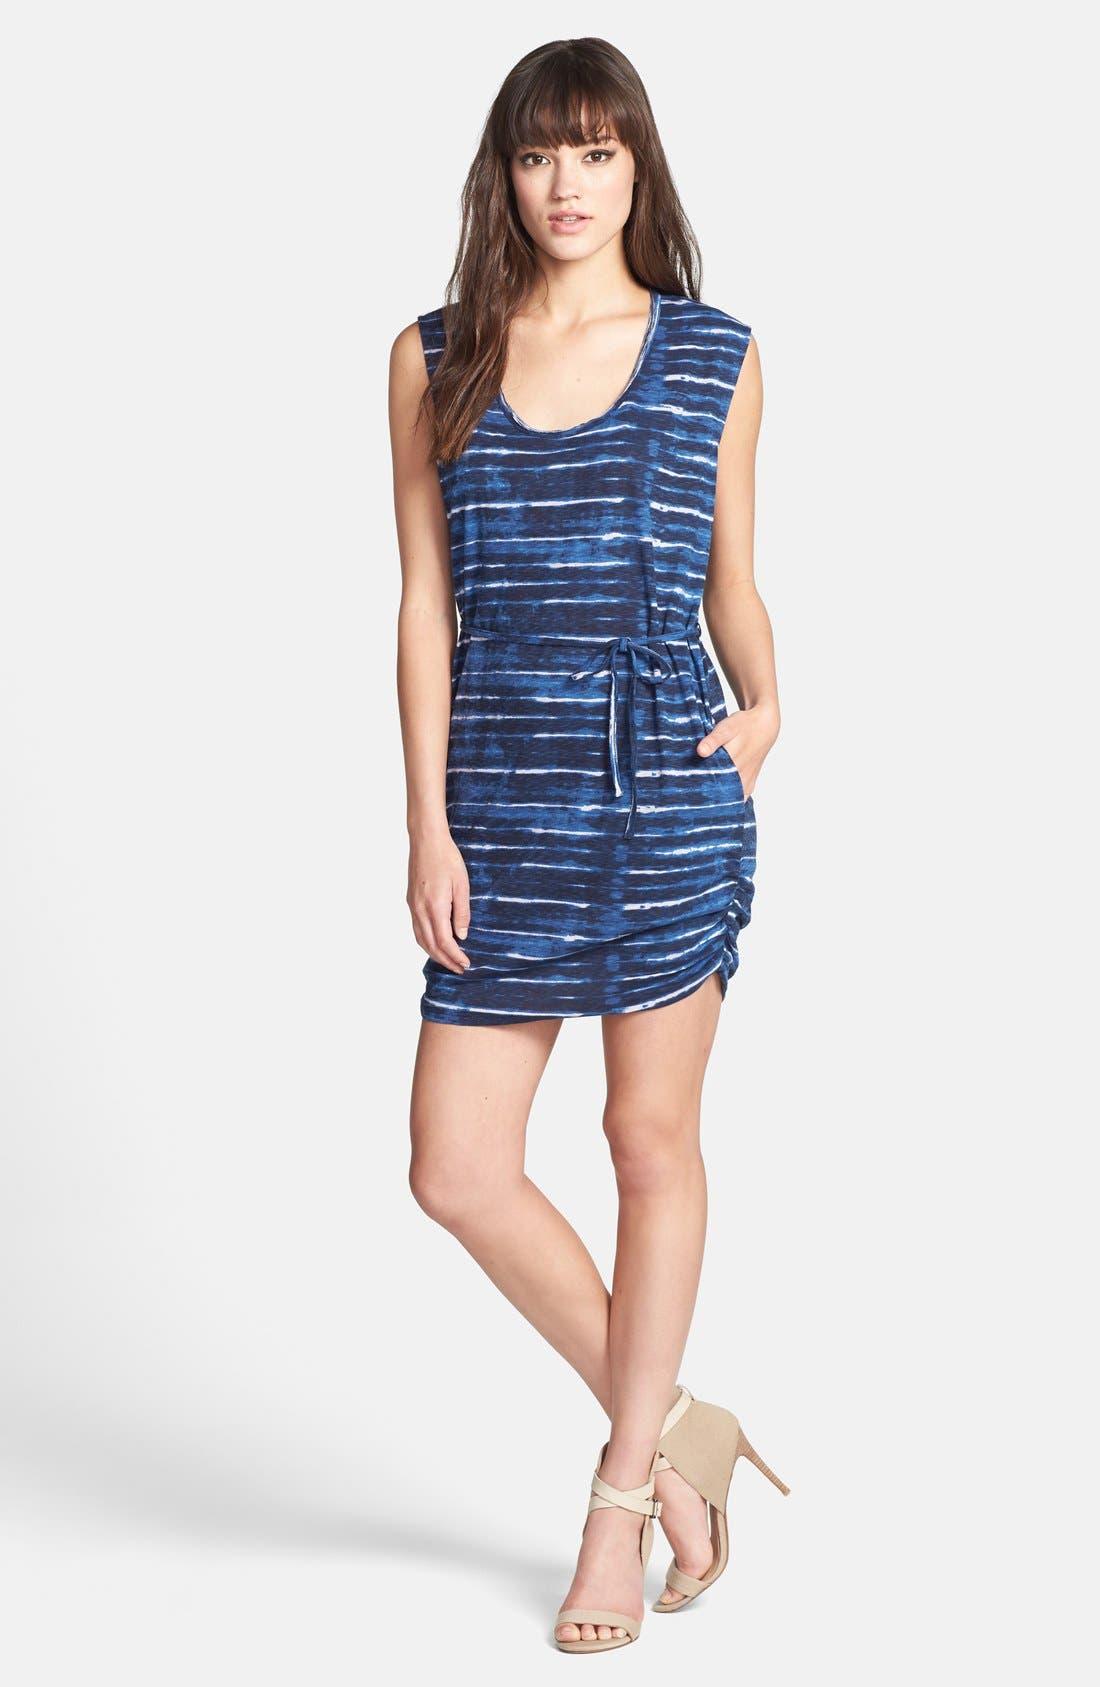 Alternate Image 1 Selected - Soft Joie 'Jute' Tie Dye Cotton Dress